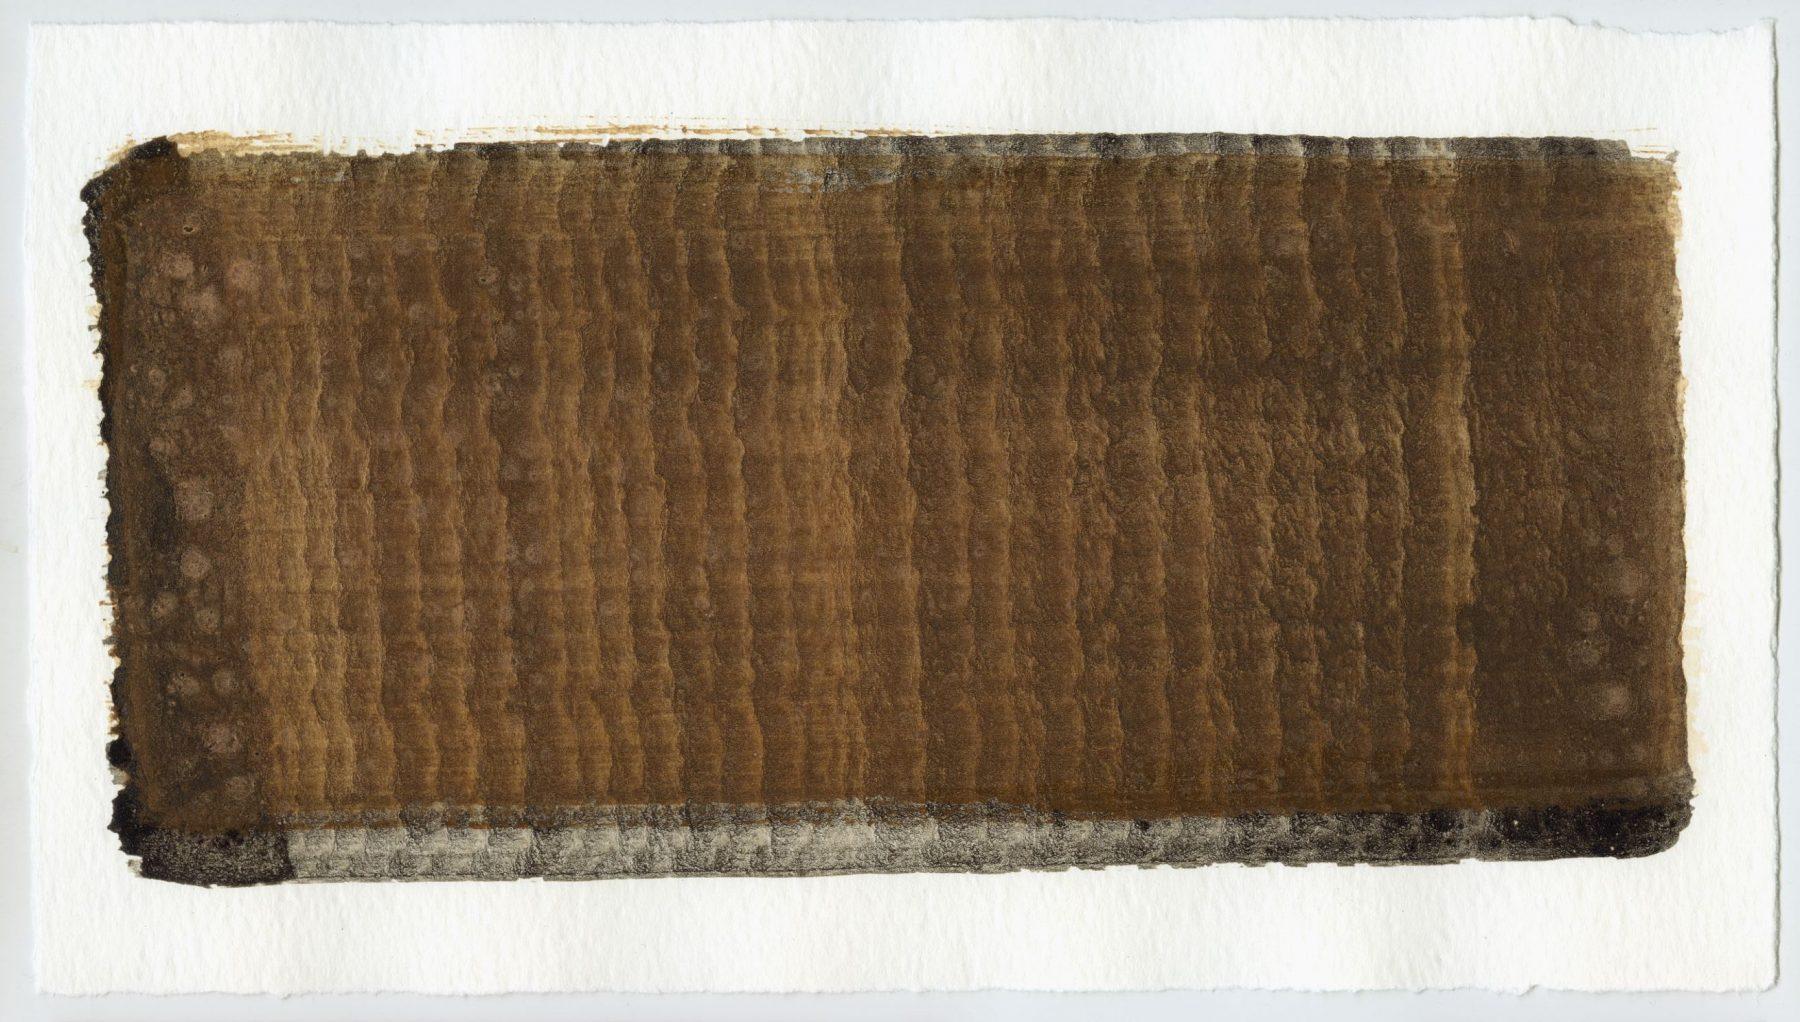 Brush stroke no. 69 - Selfmade pigment: Slingerpad bruin, IJzeroer, Boekels roze